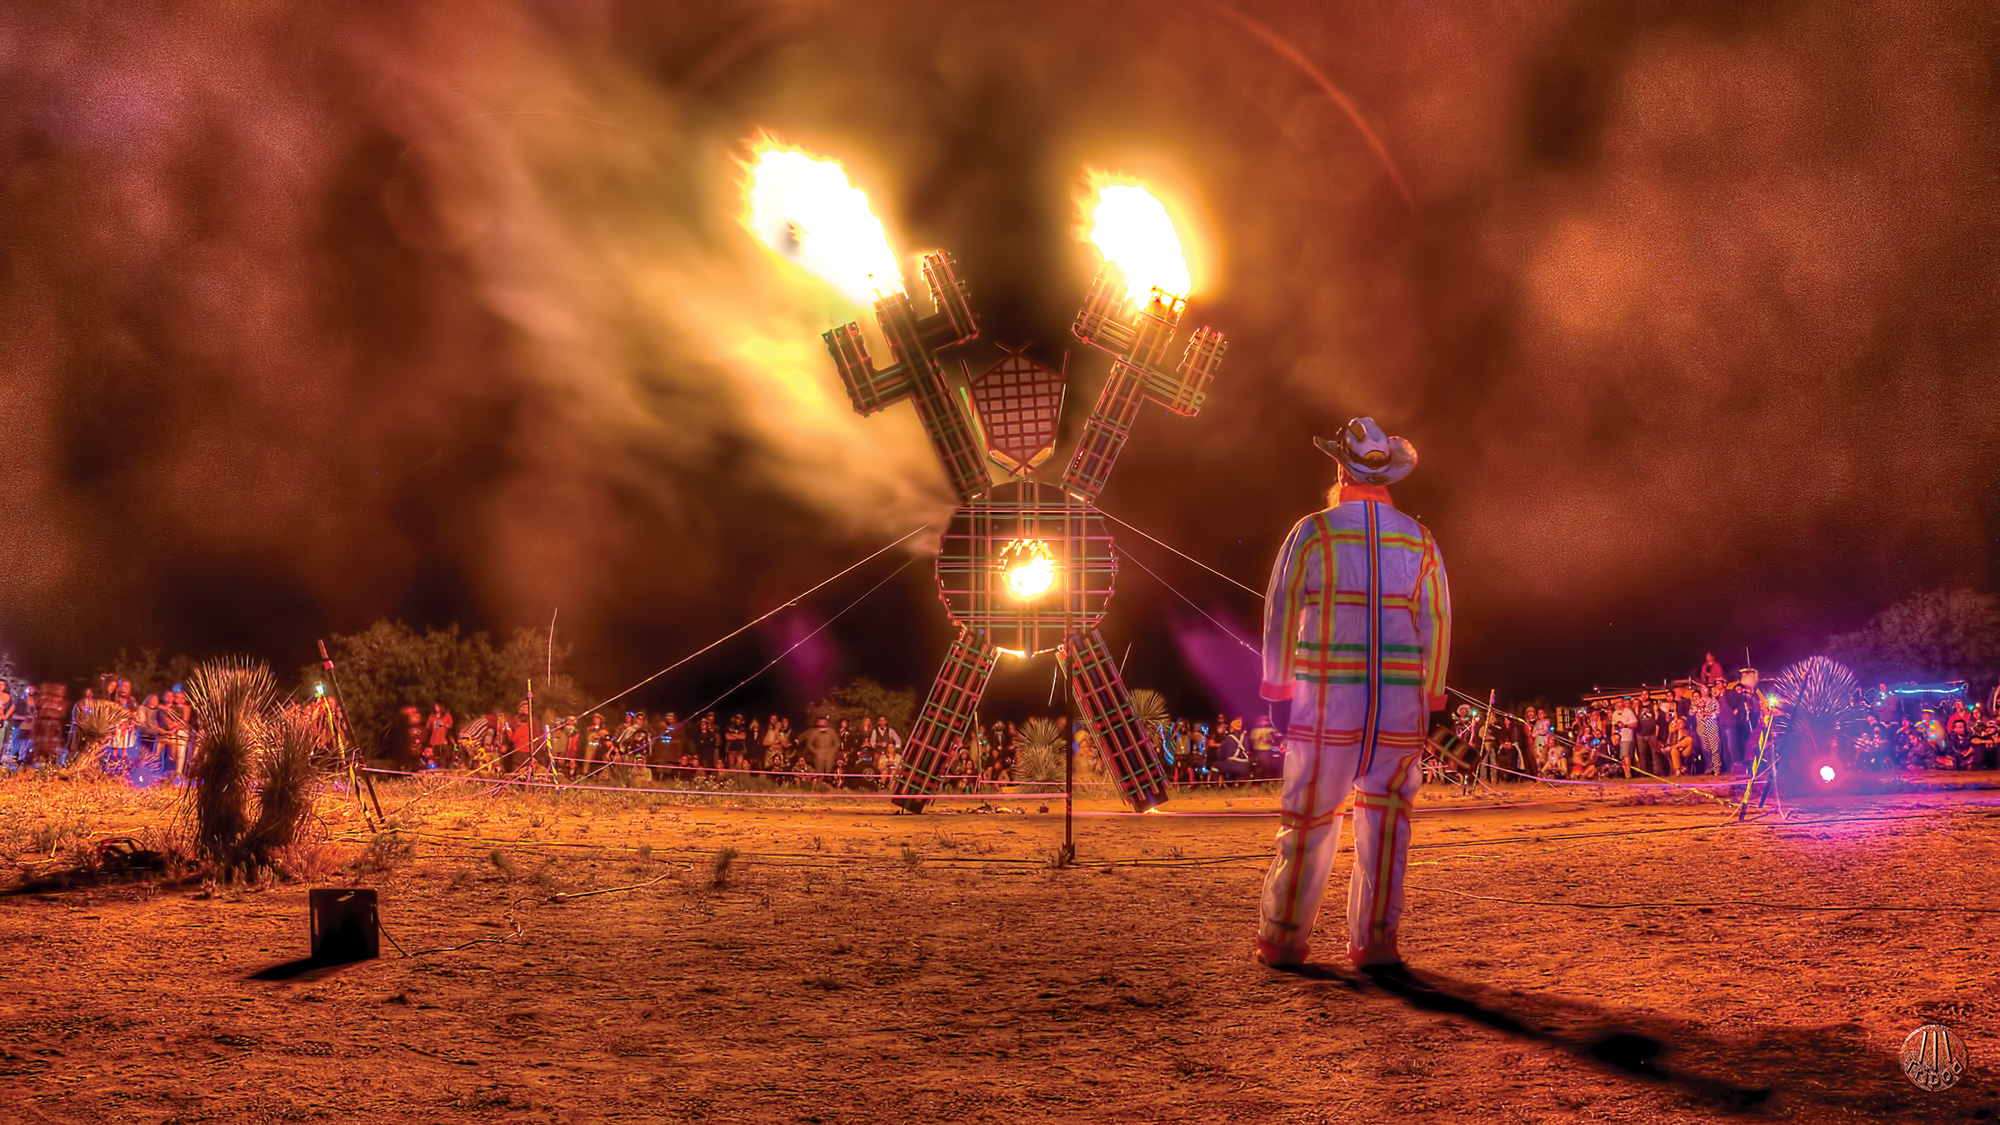 Plaid Man by Todd Noris at Saguaro Man; Photo by Todd Norris/courtesy Saguaro Man